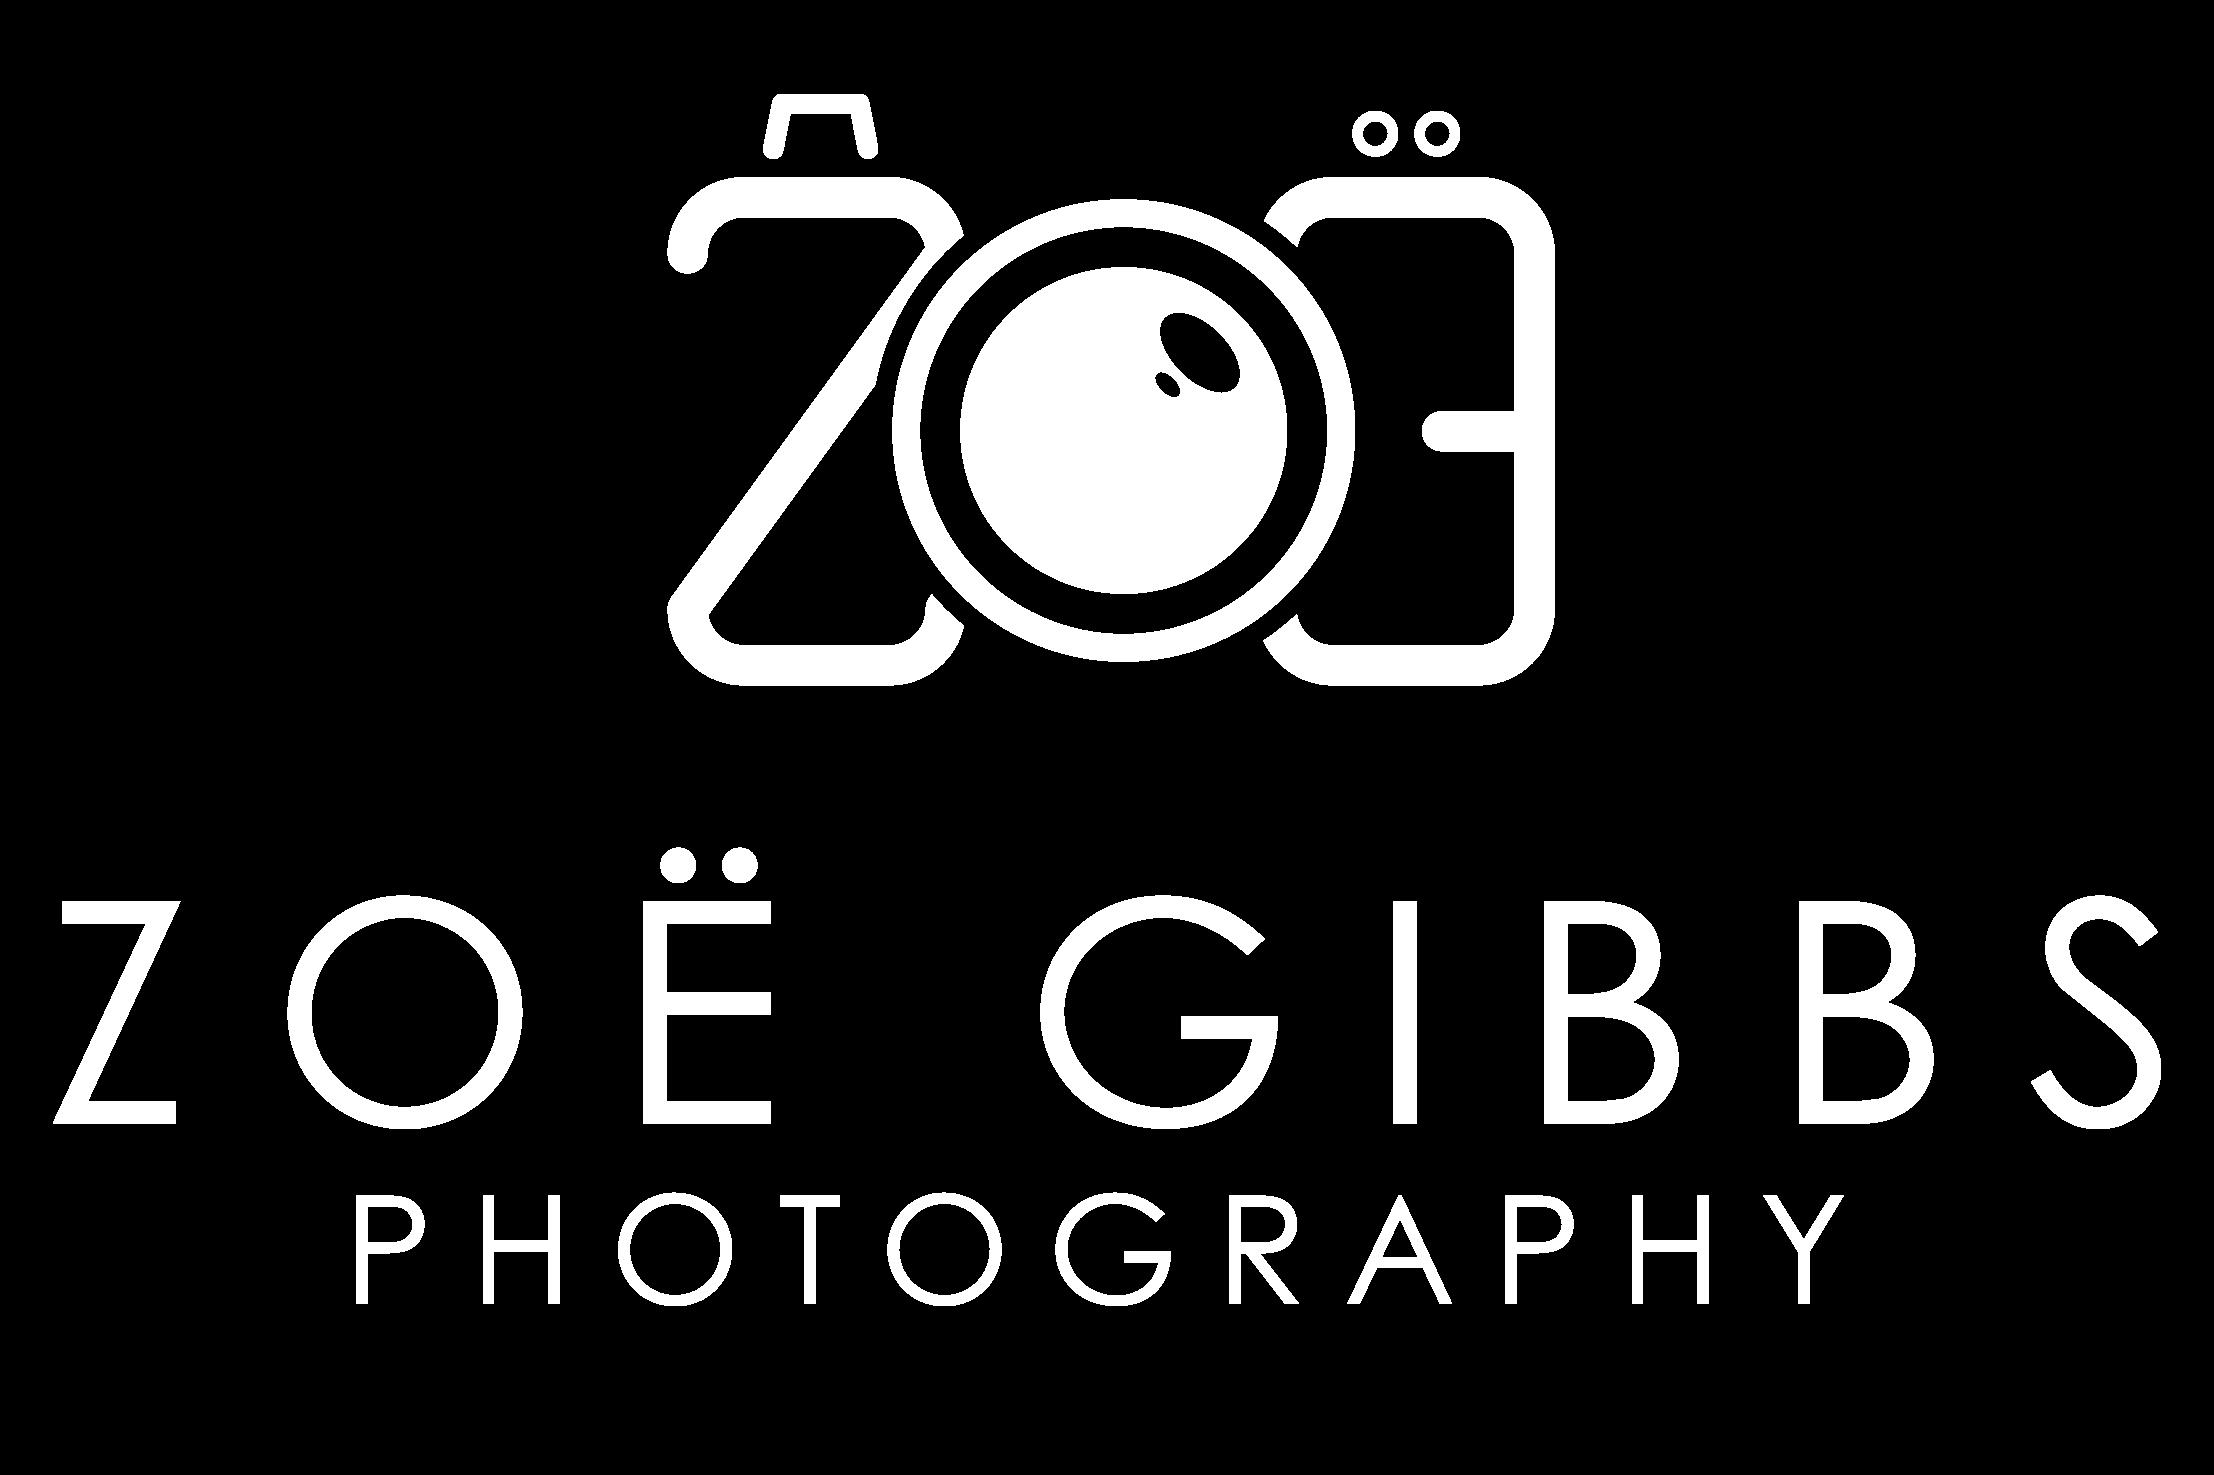 Studio Portrait Photography in Felixstowe, Suffolk